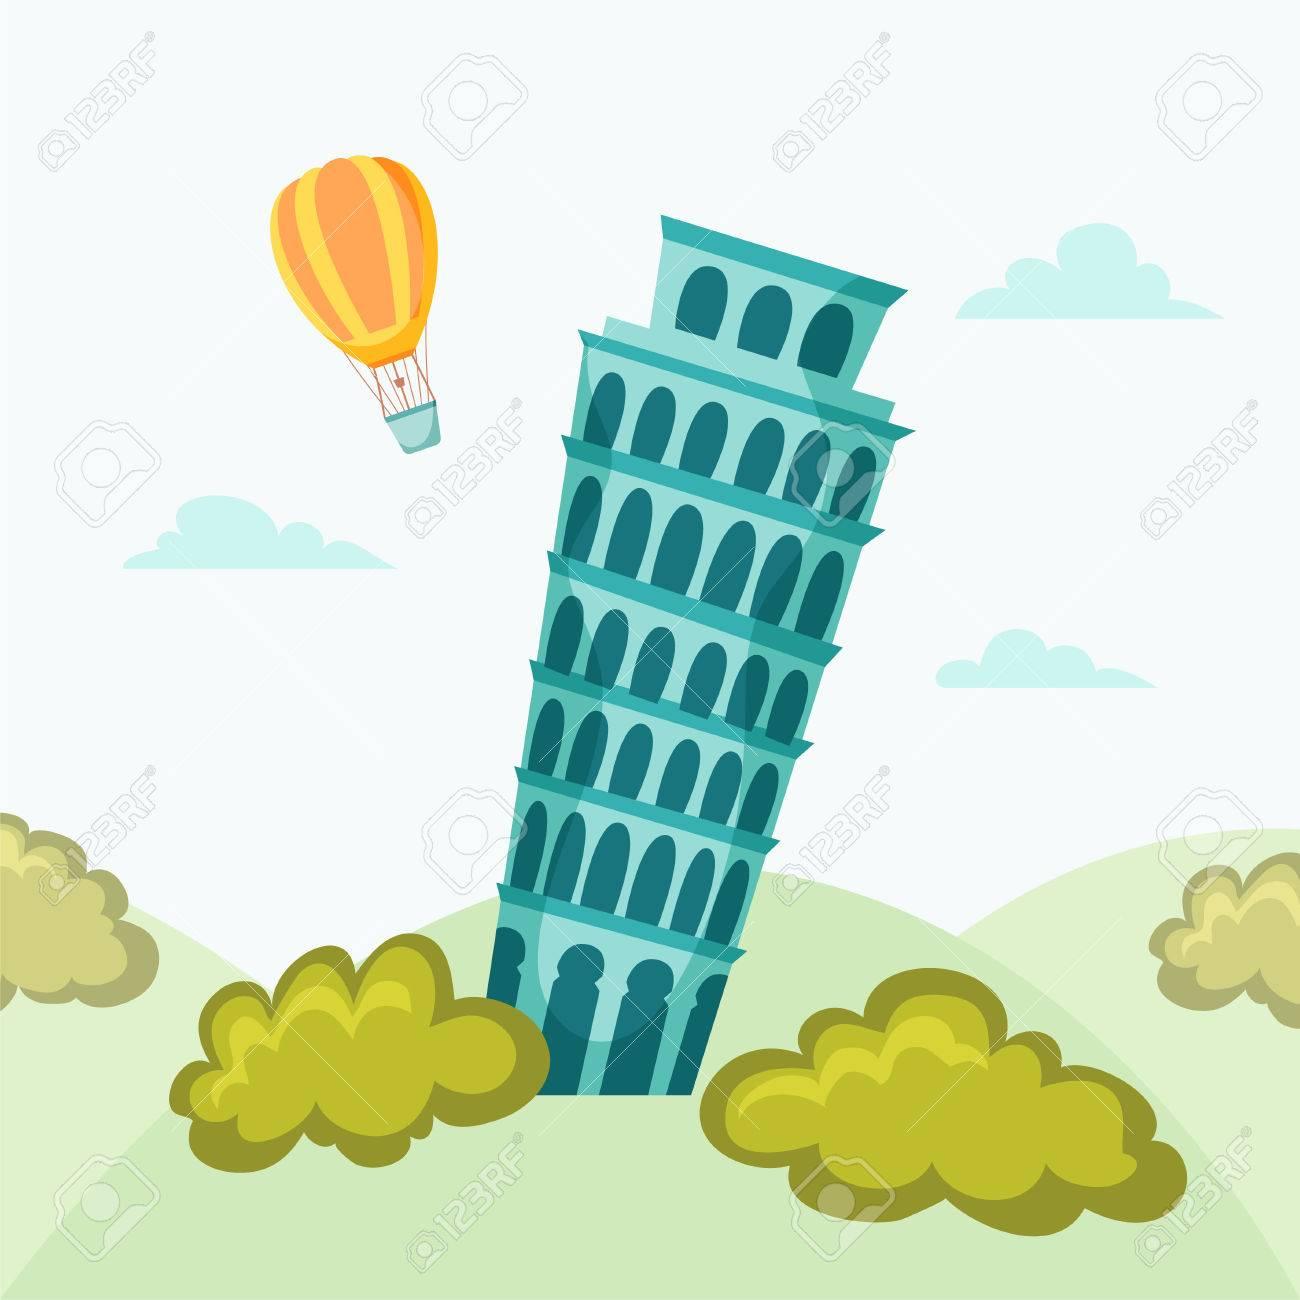 Leaning tower of Pisa. Pisa landmark. Travel flat illustration. Rome famous buildings background. Cityscape with Leaning tower of Pisa. - 52415046